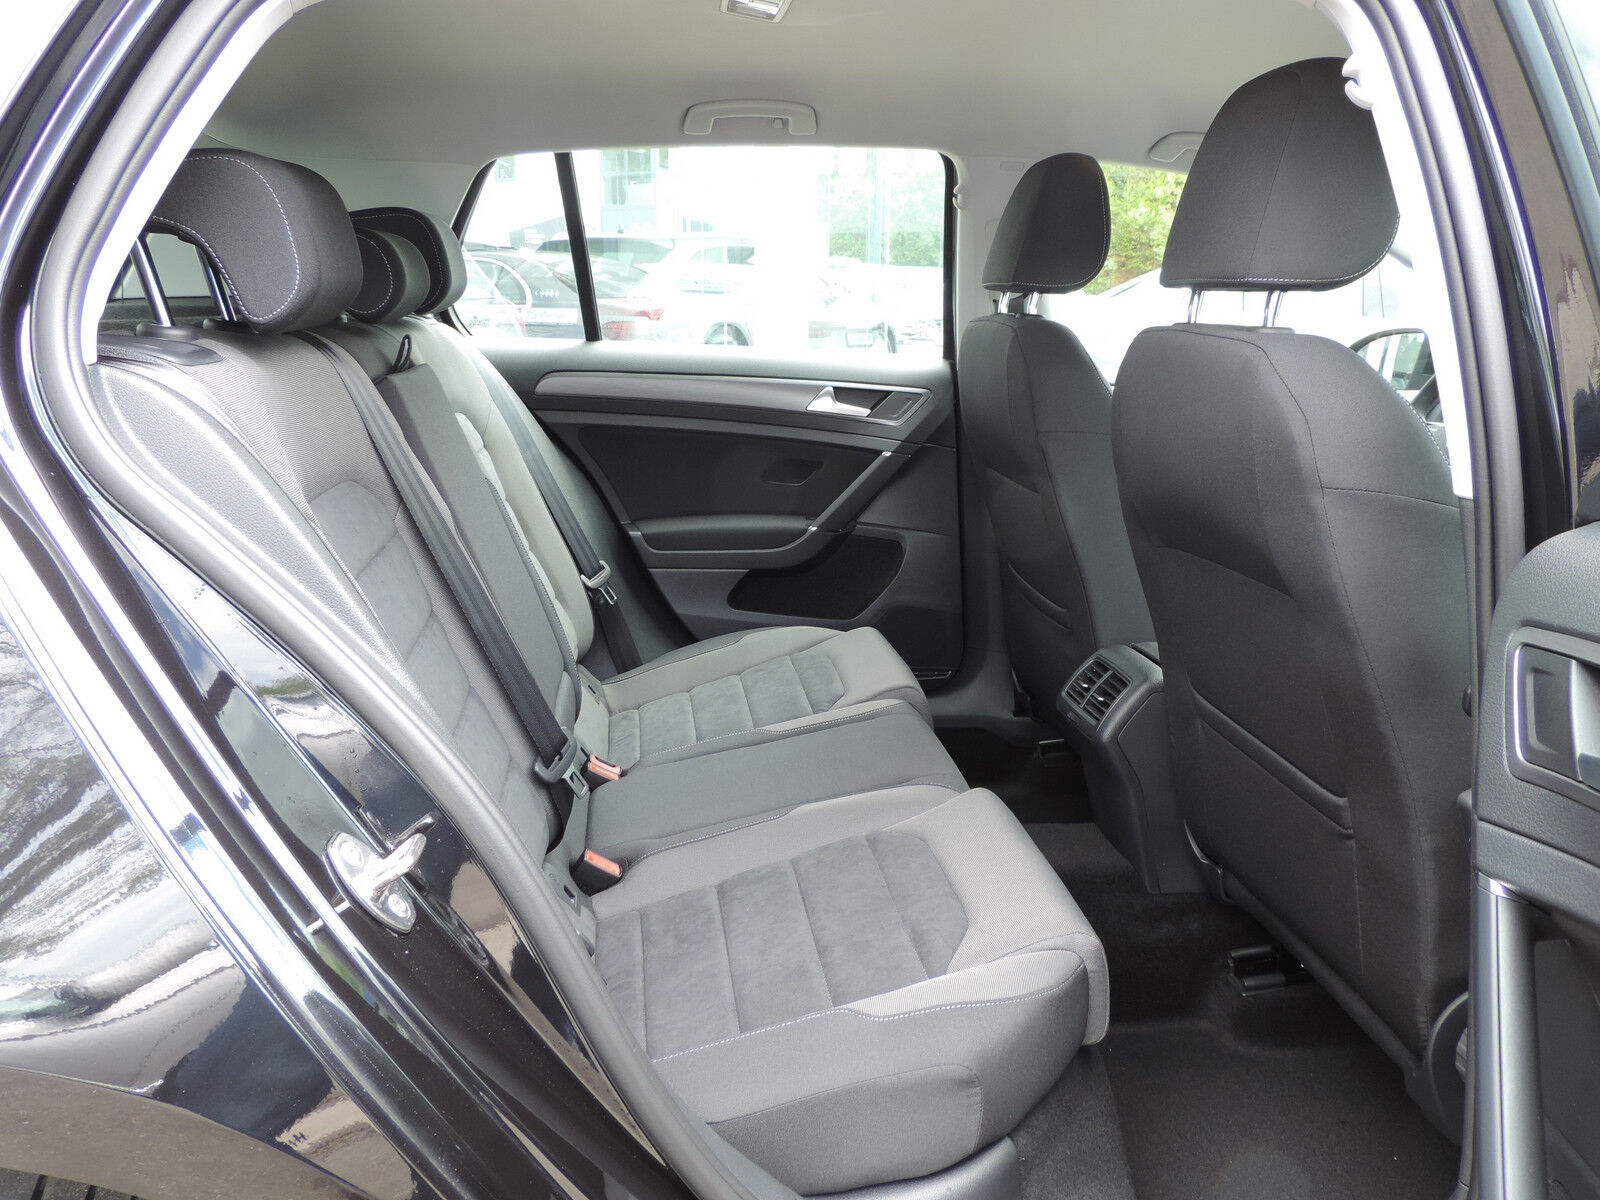 Volkswagen Golf 1.6 TDI R-LINE CLIMA REGUL ACC GPS LED NEUVE 8/15